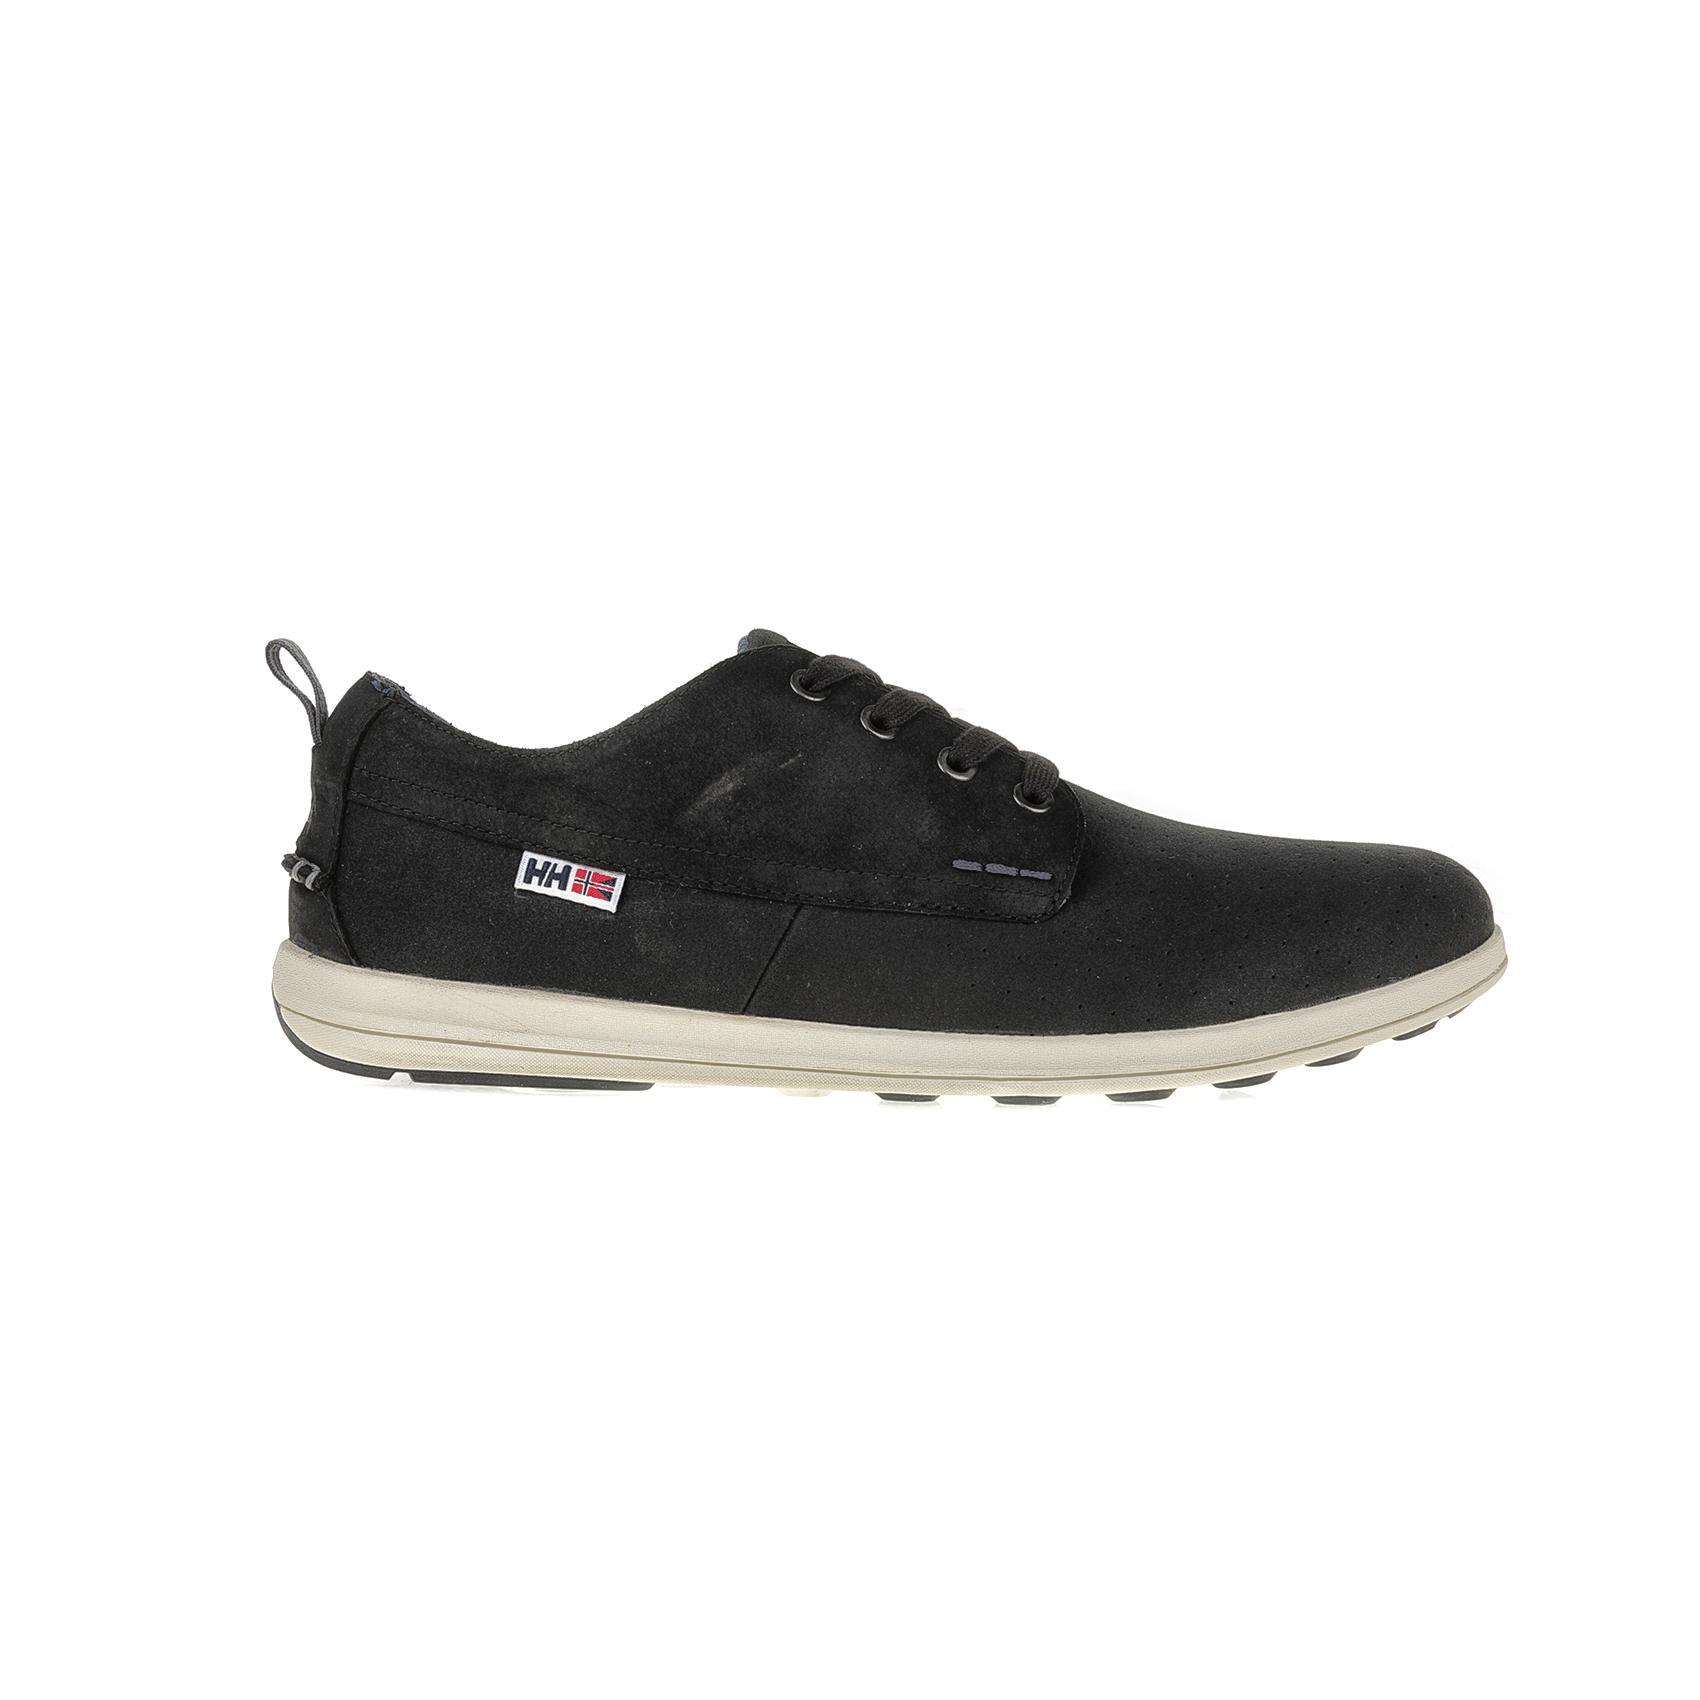 0dc7f3c7bc6 HELLY HANSEN - Ανδρικά παπούτσια HELLY HANSEN BERGSHAVEN μαύρα